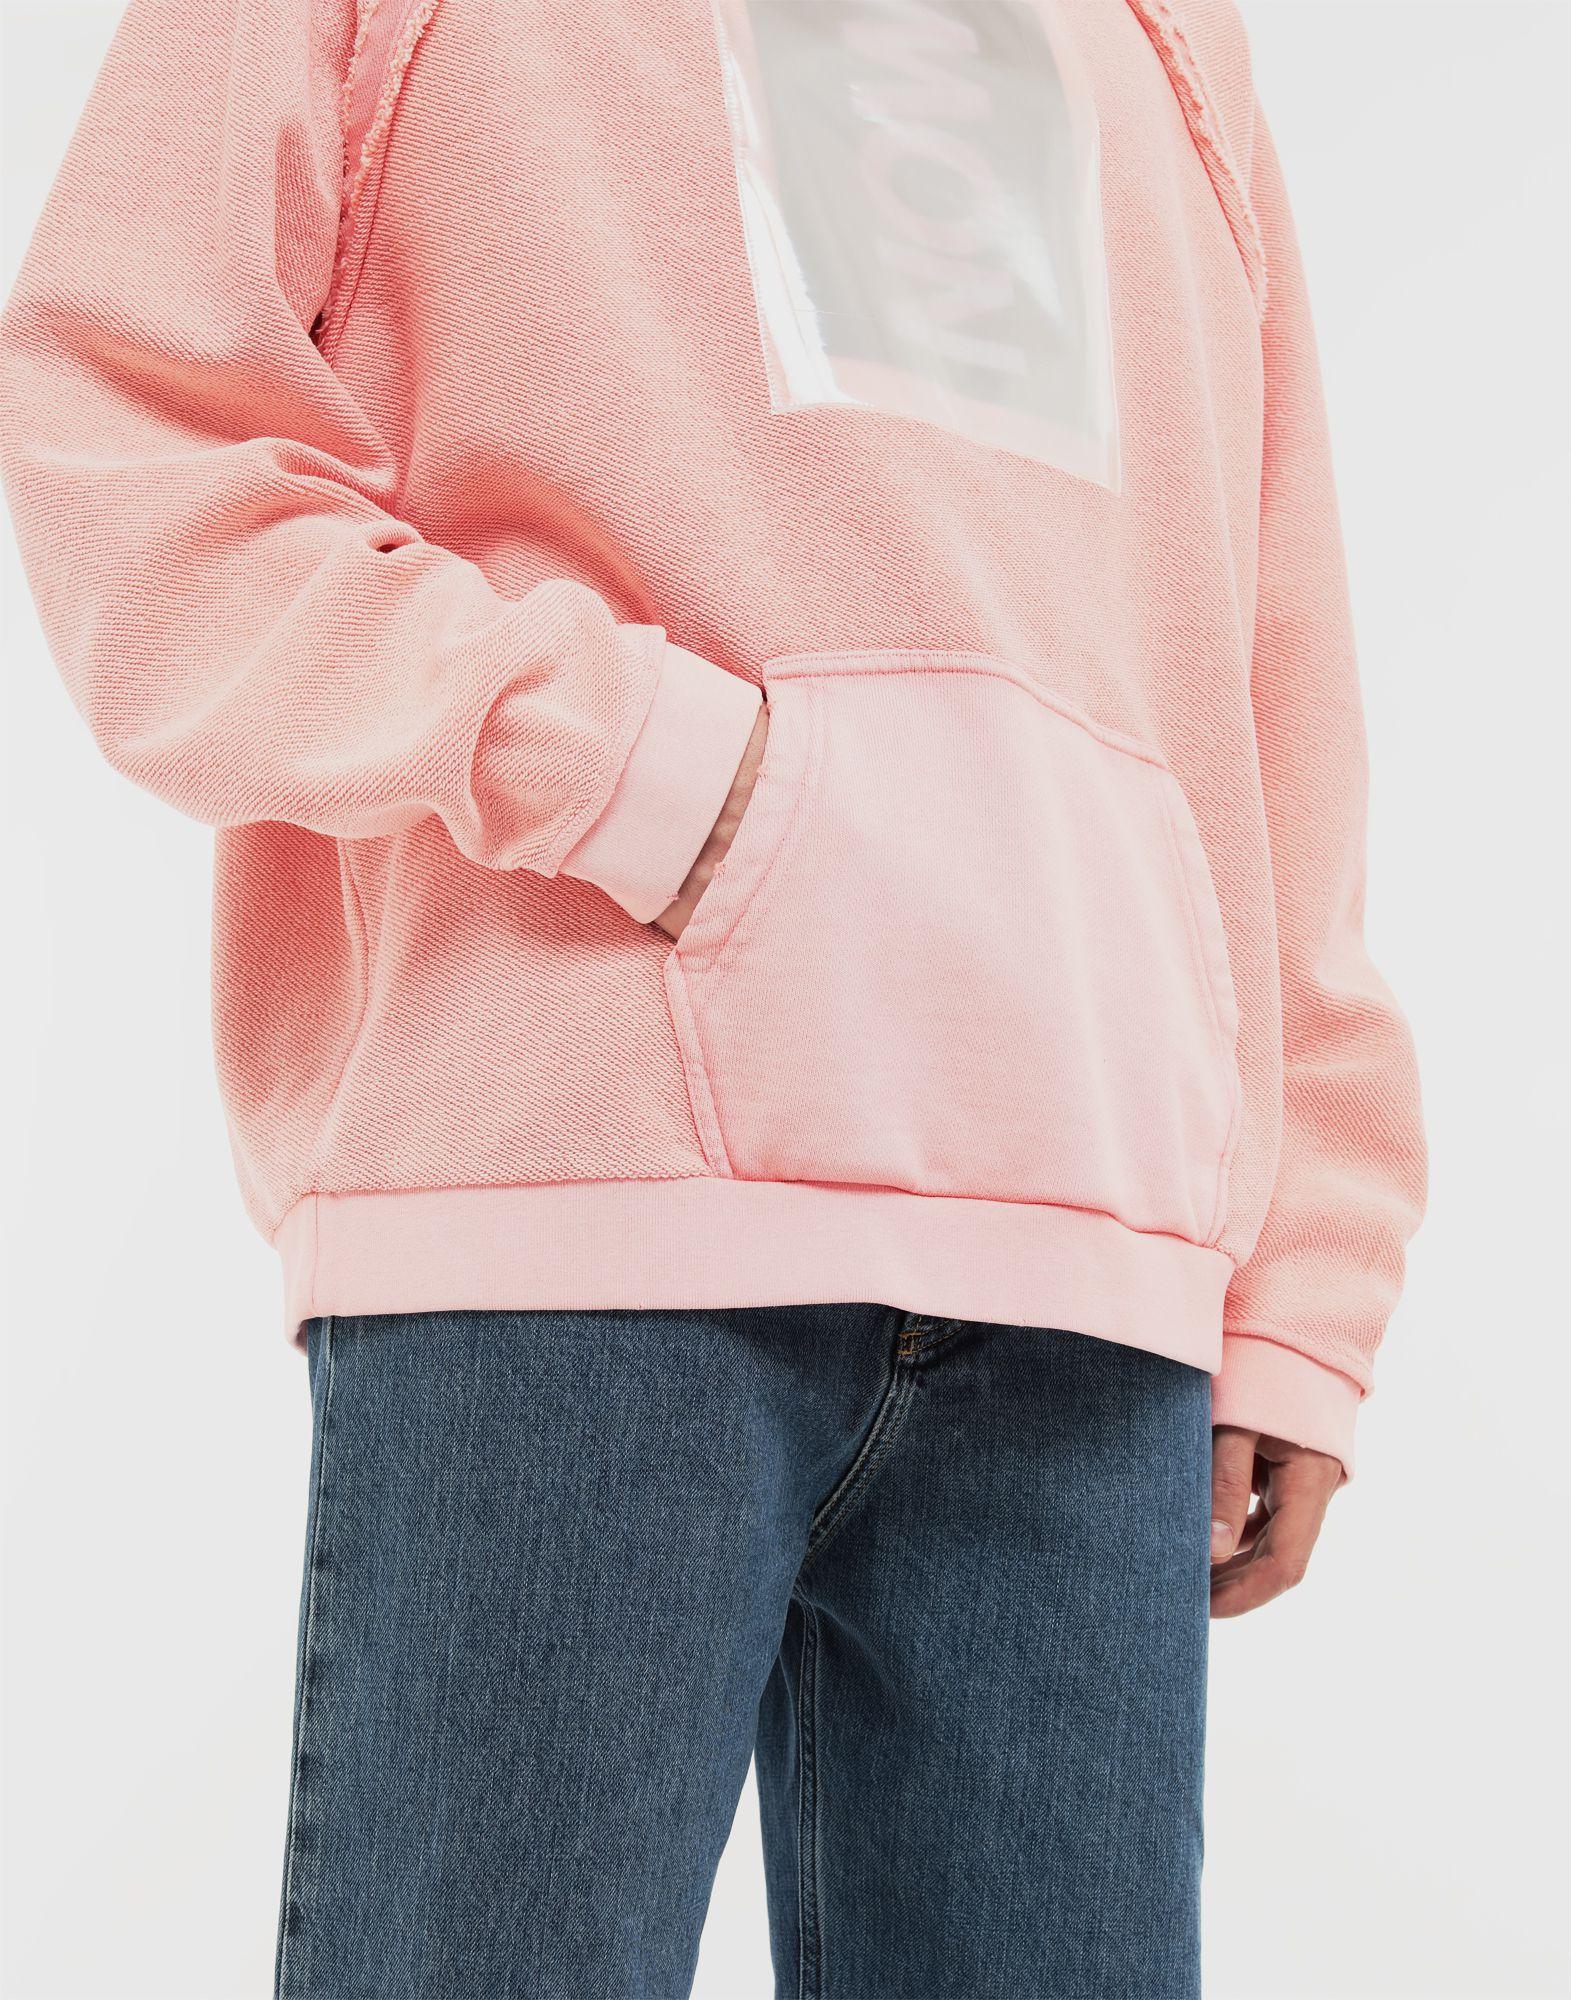 MAISON MARGIELA NOW print jersey sweatshirt Sweatshirt Man b